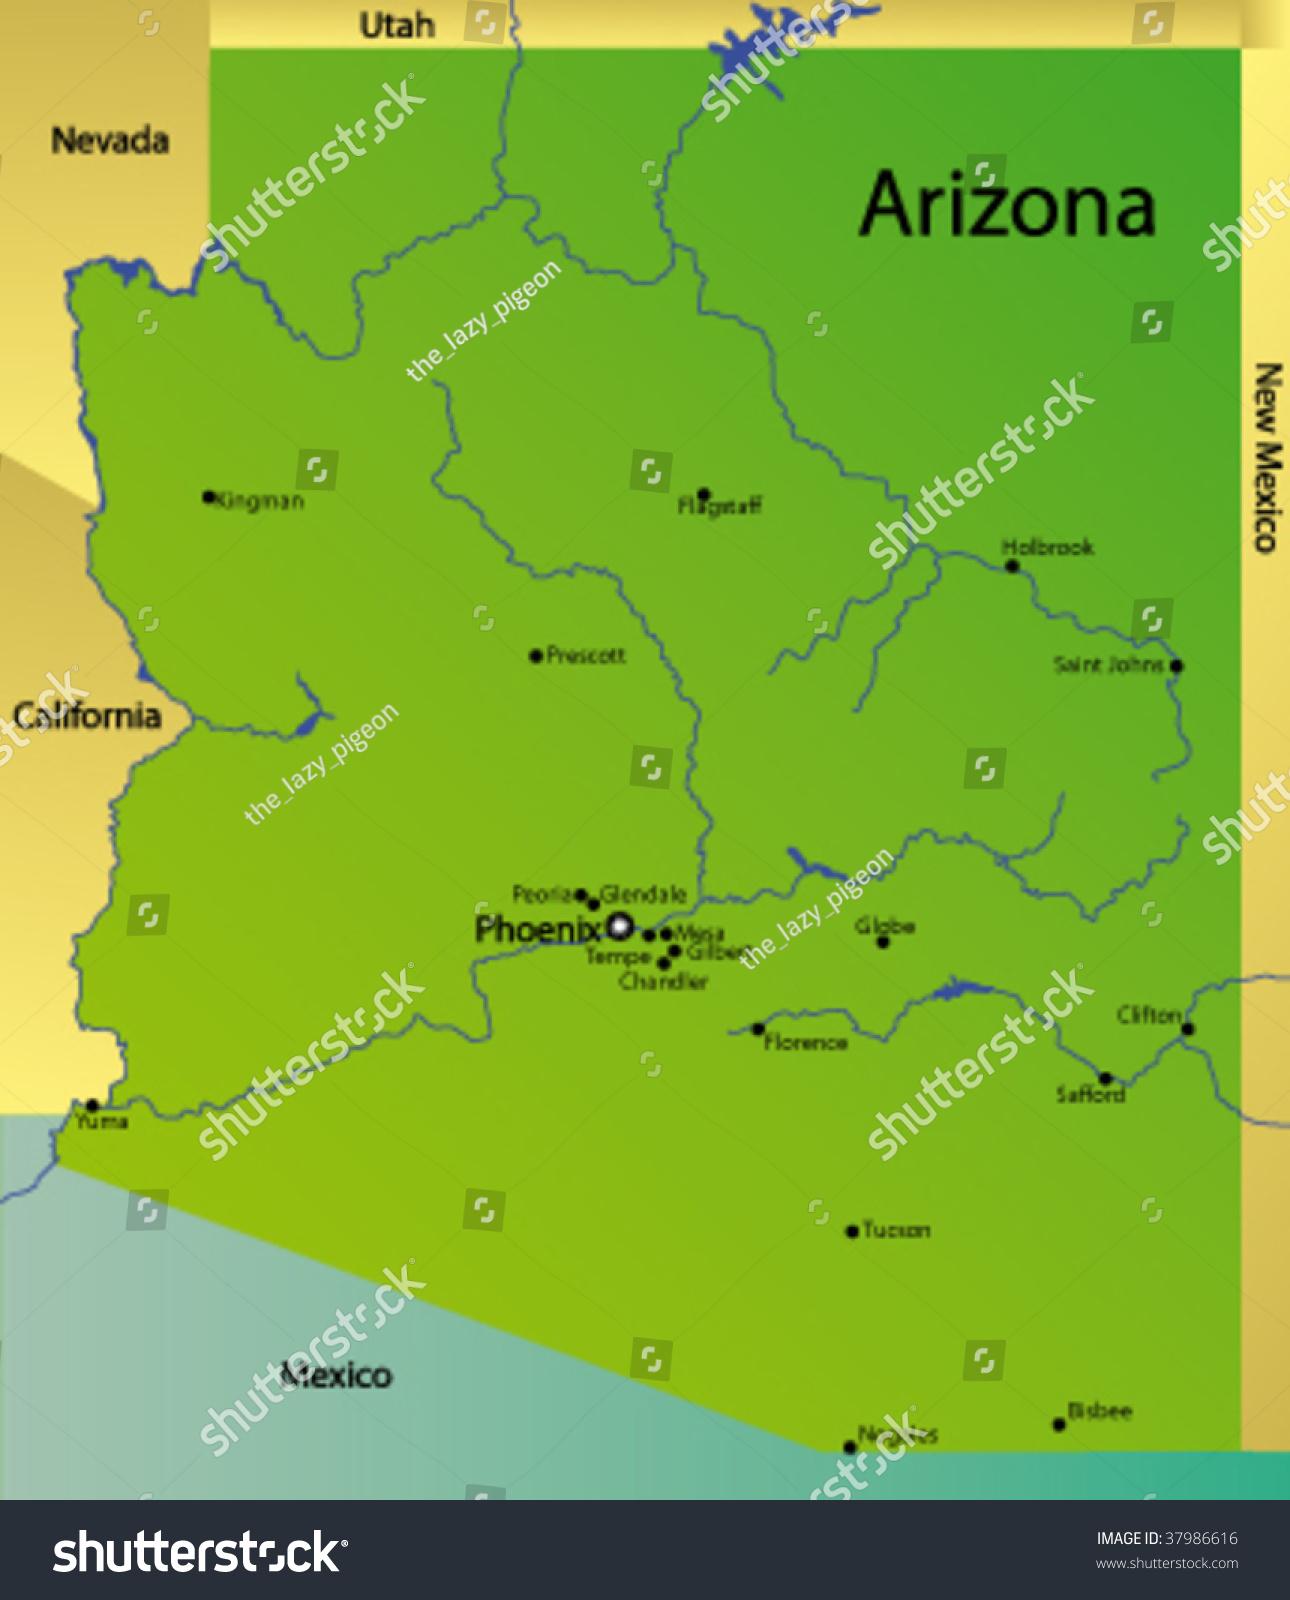 Detailed Vector Map Arizona State Usa Stock Vector - Arizona map usa